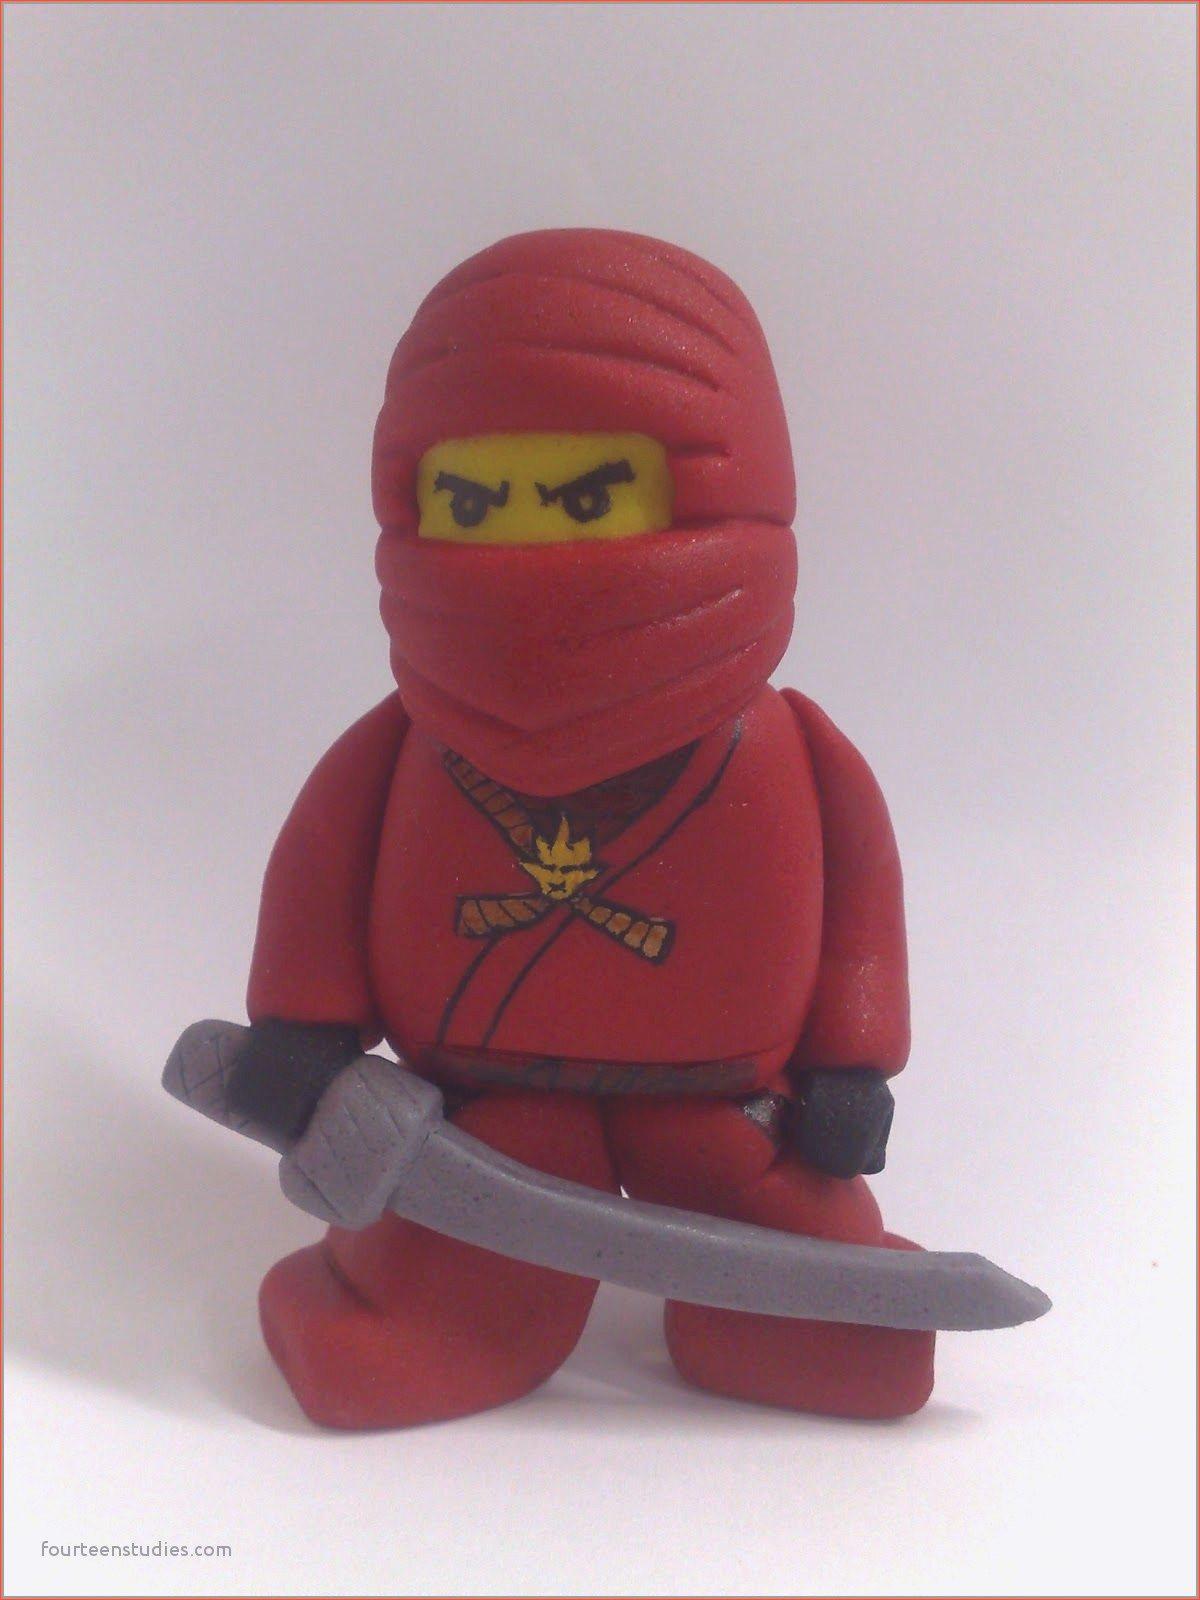 Lego Ninjago Malvorlagen Einzigartig Ausmalbilder Ninjago Anacondrai Sammlung